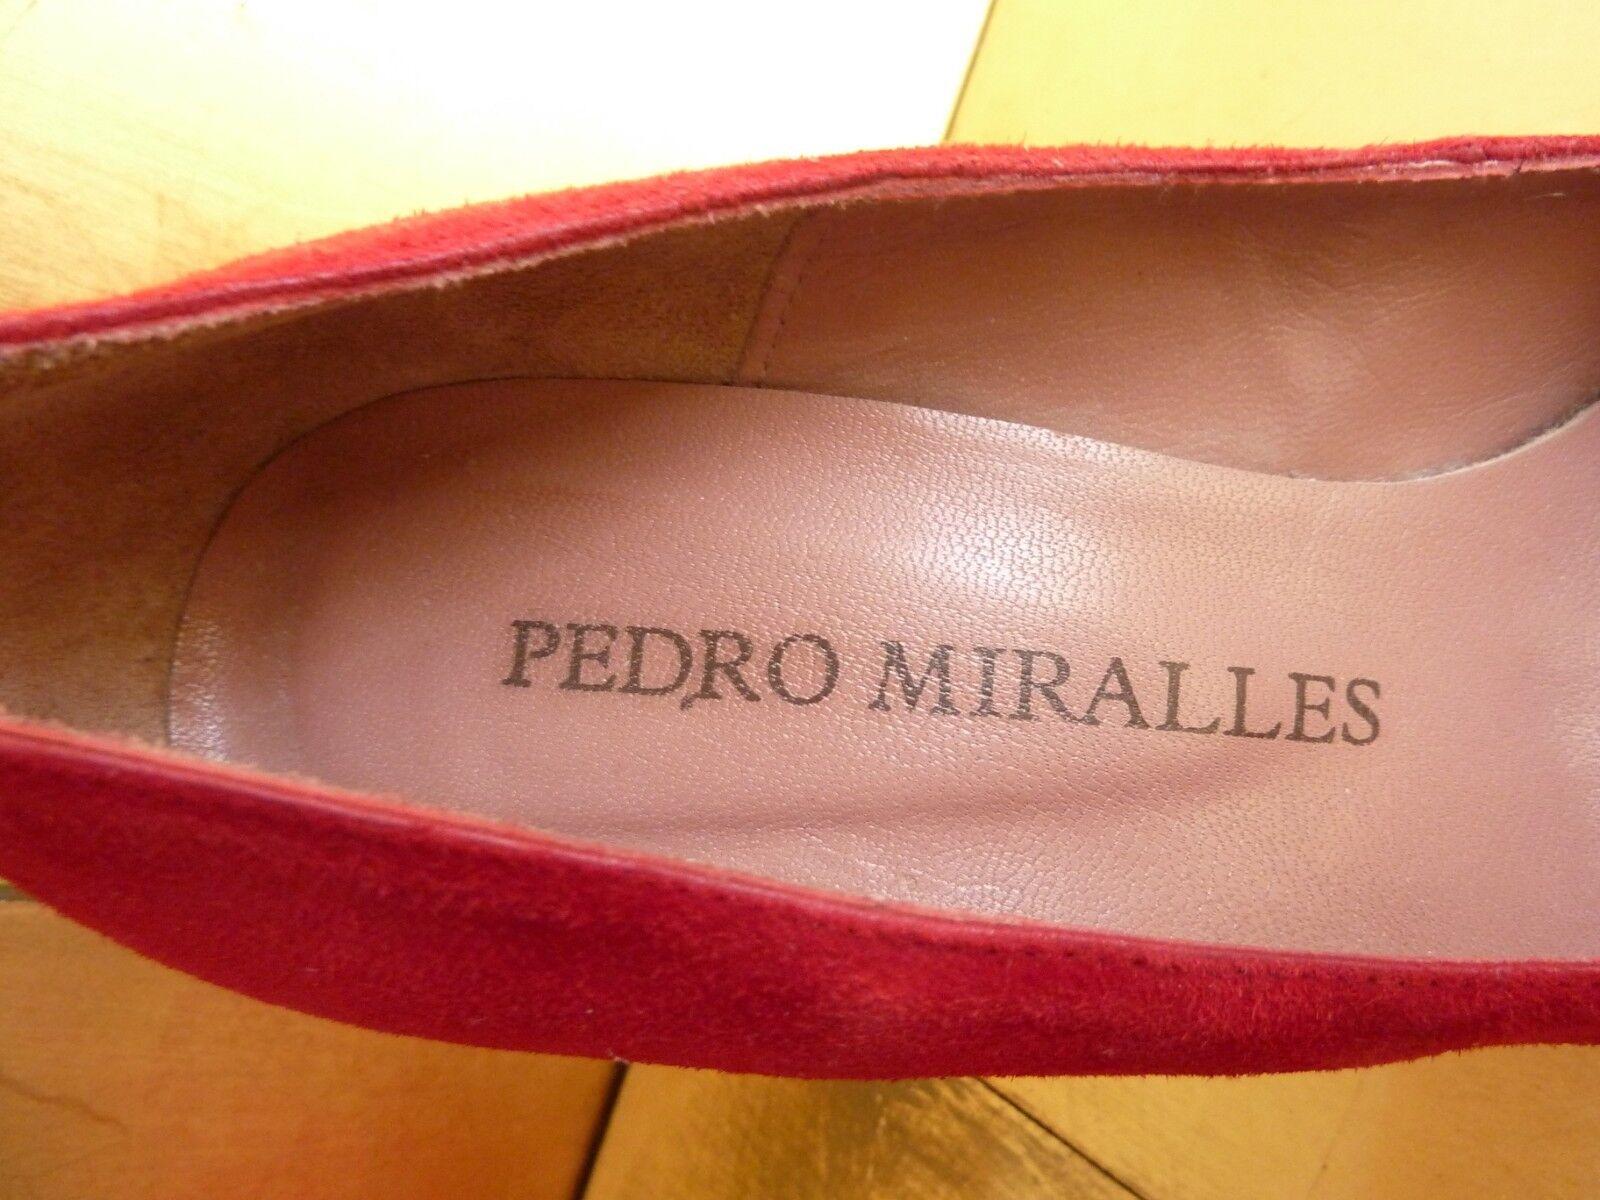 PEDRO MIRALLES, PUMPS, ROT, WILDLEDER, WILDLEDER, WILDLEDER, ABSATZ 12 cm, Plateau 2,5 cm, Gr. 41 c161f8